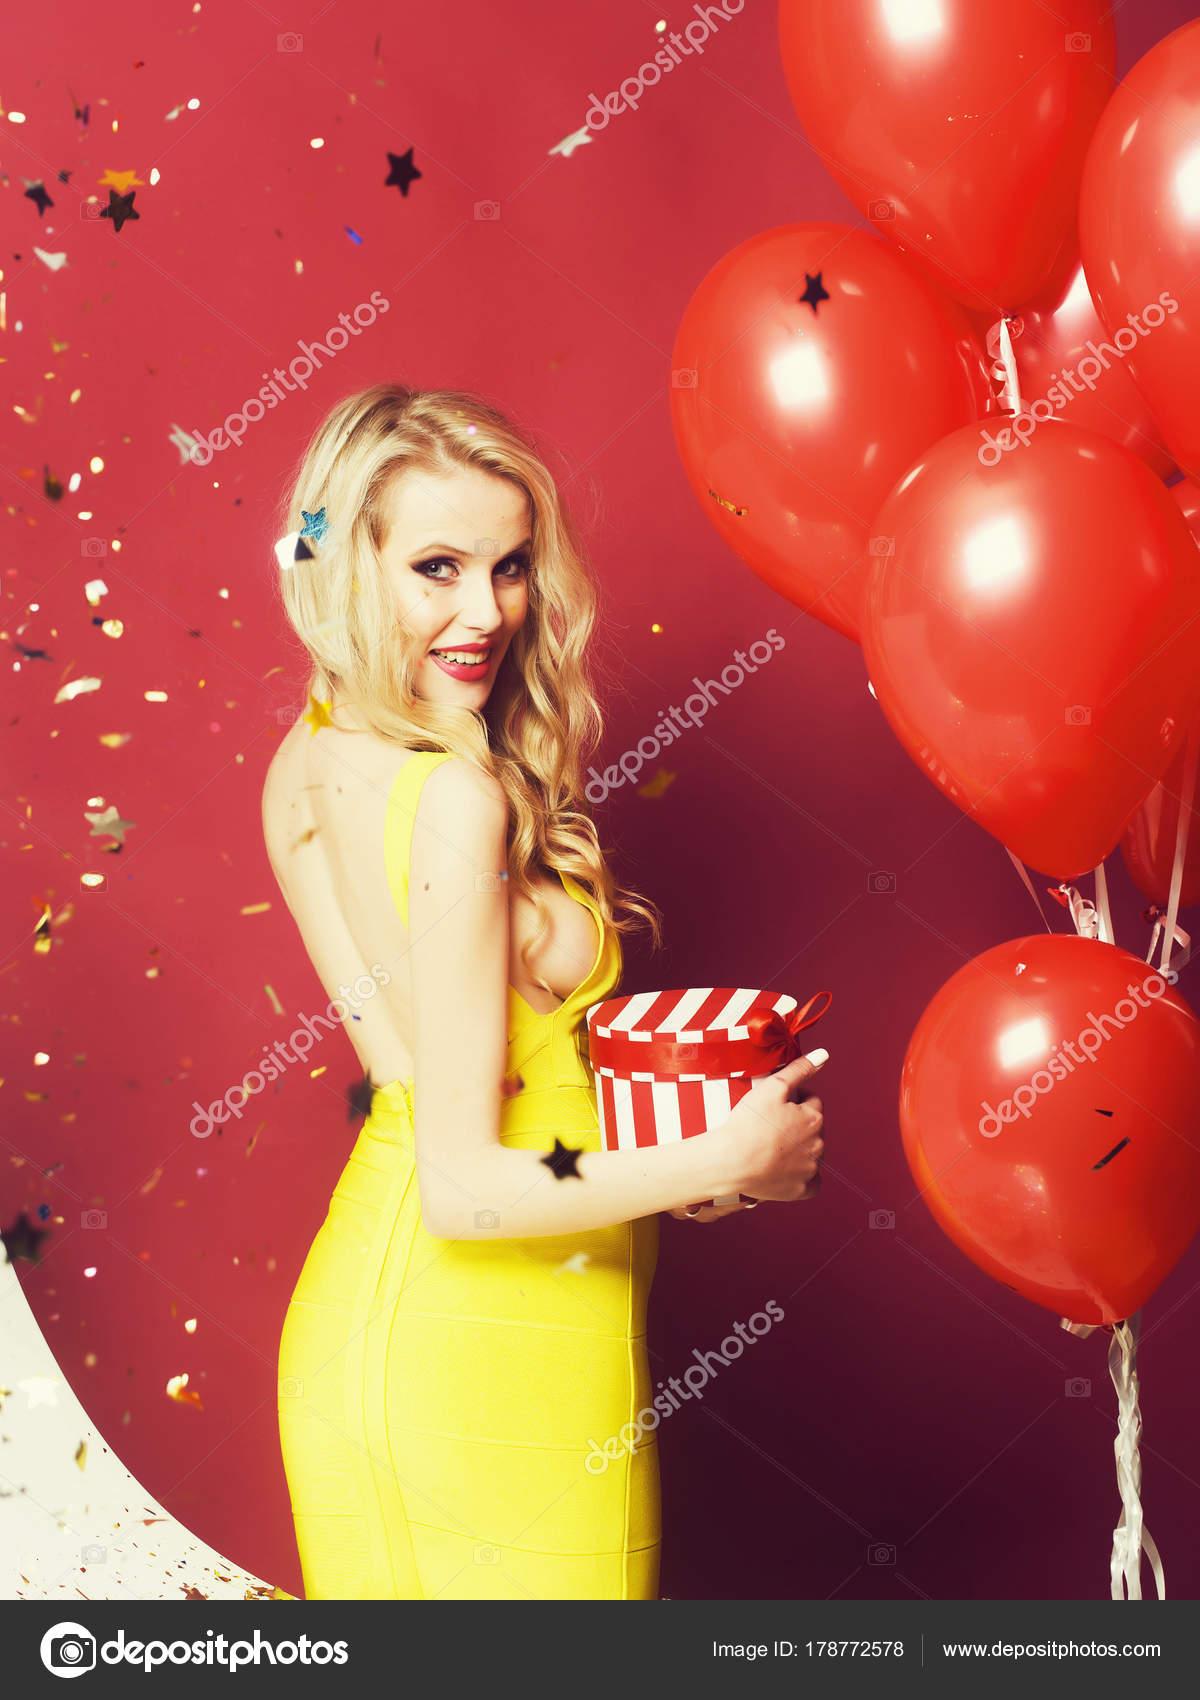 Alles Gute Zum Geburtstag Frau Stockfoto C Tverdohlib Com 178772578